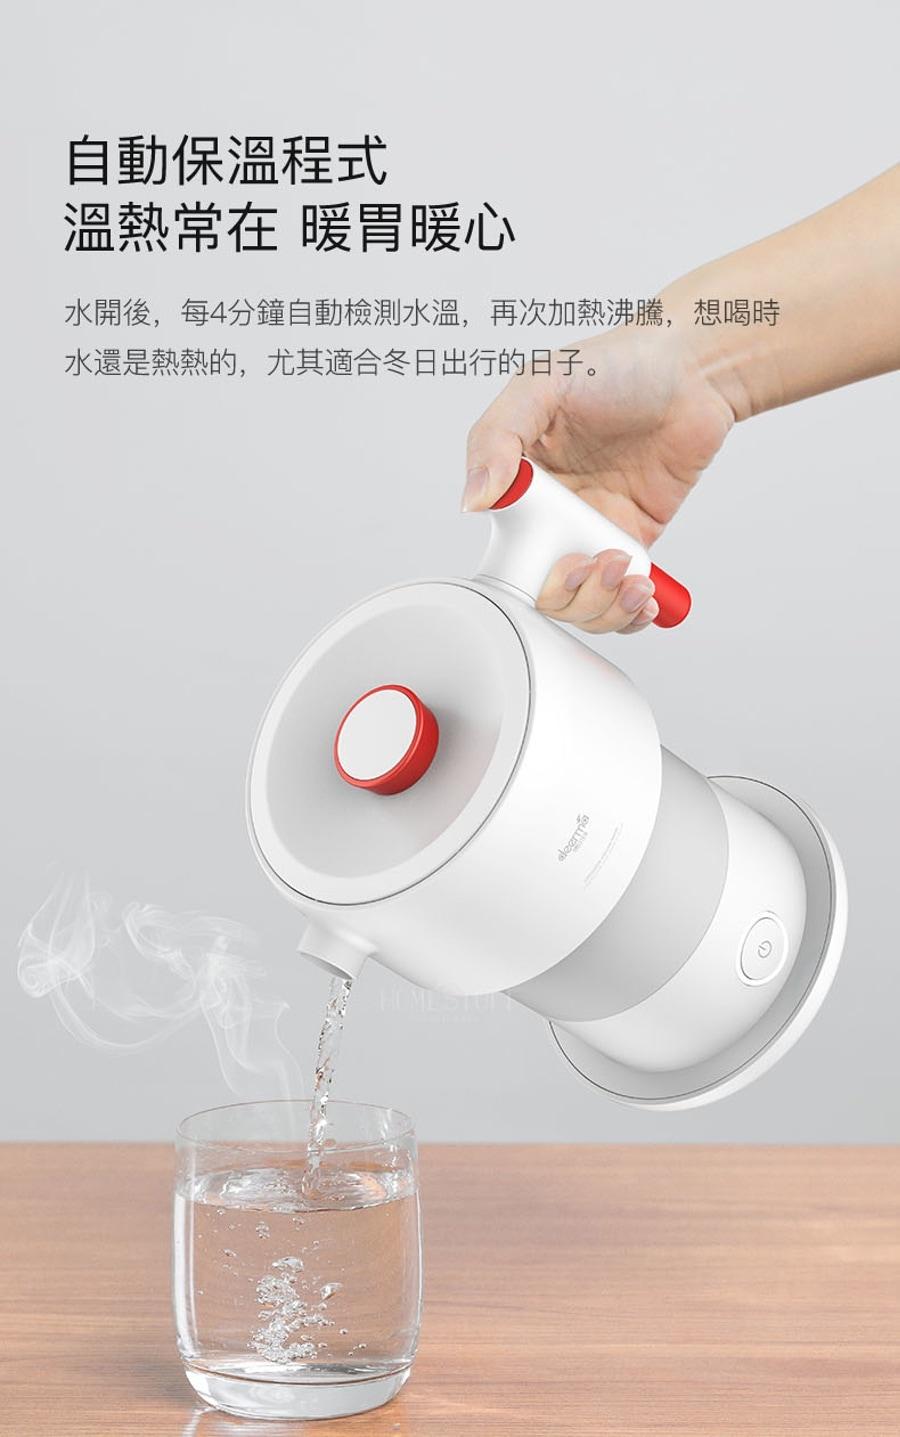 Deerma 德爾瑪 DH060BH 多功能摺疊式電熱水壺